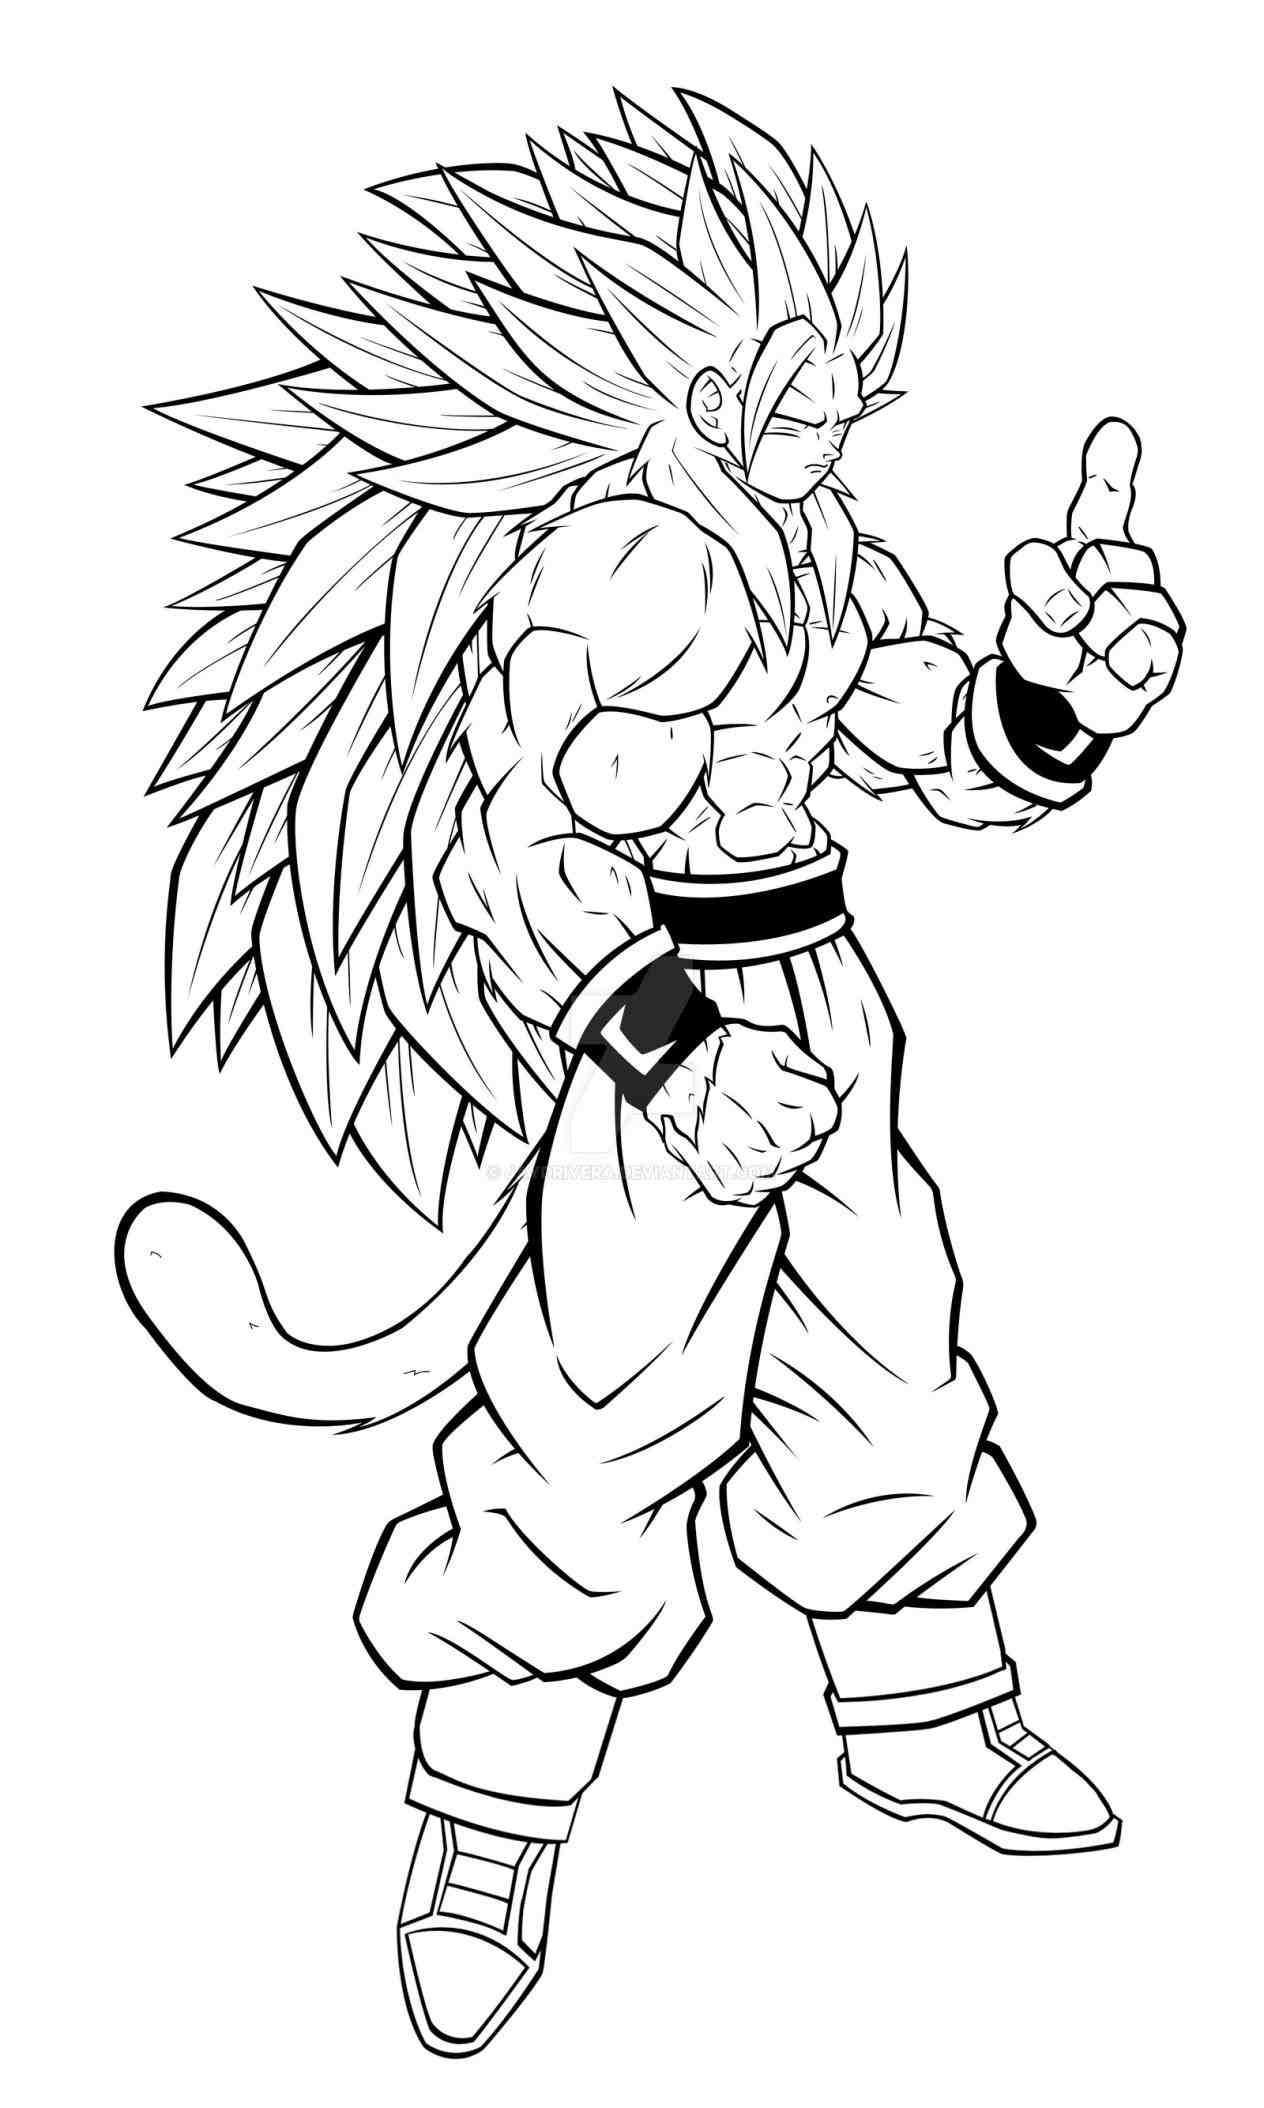 Dragon Ball Super Coloring Pages  Dragon Ball Z Coloring Pages Goku Super Saiyan 5 AZ